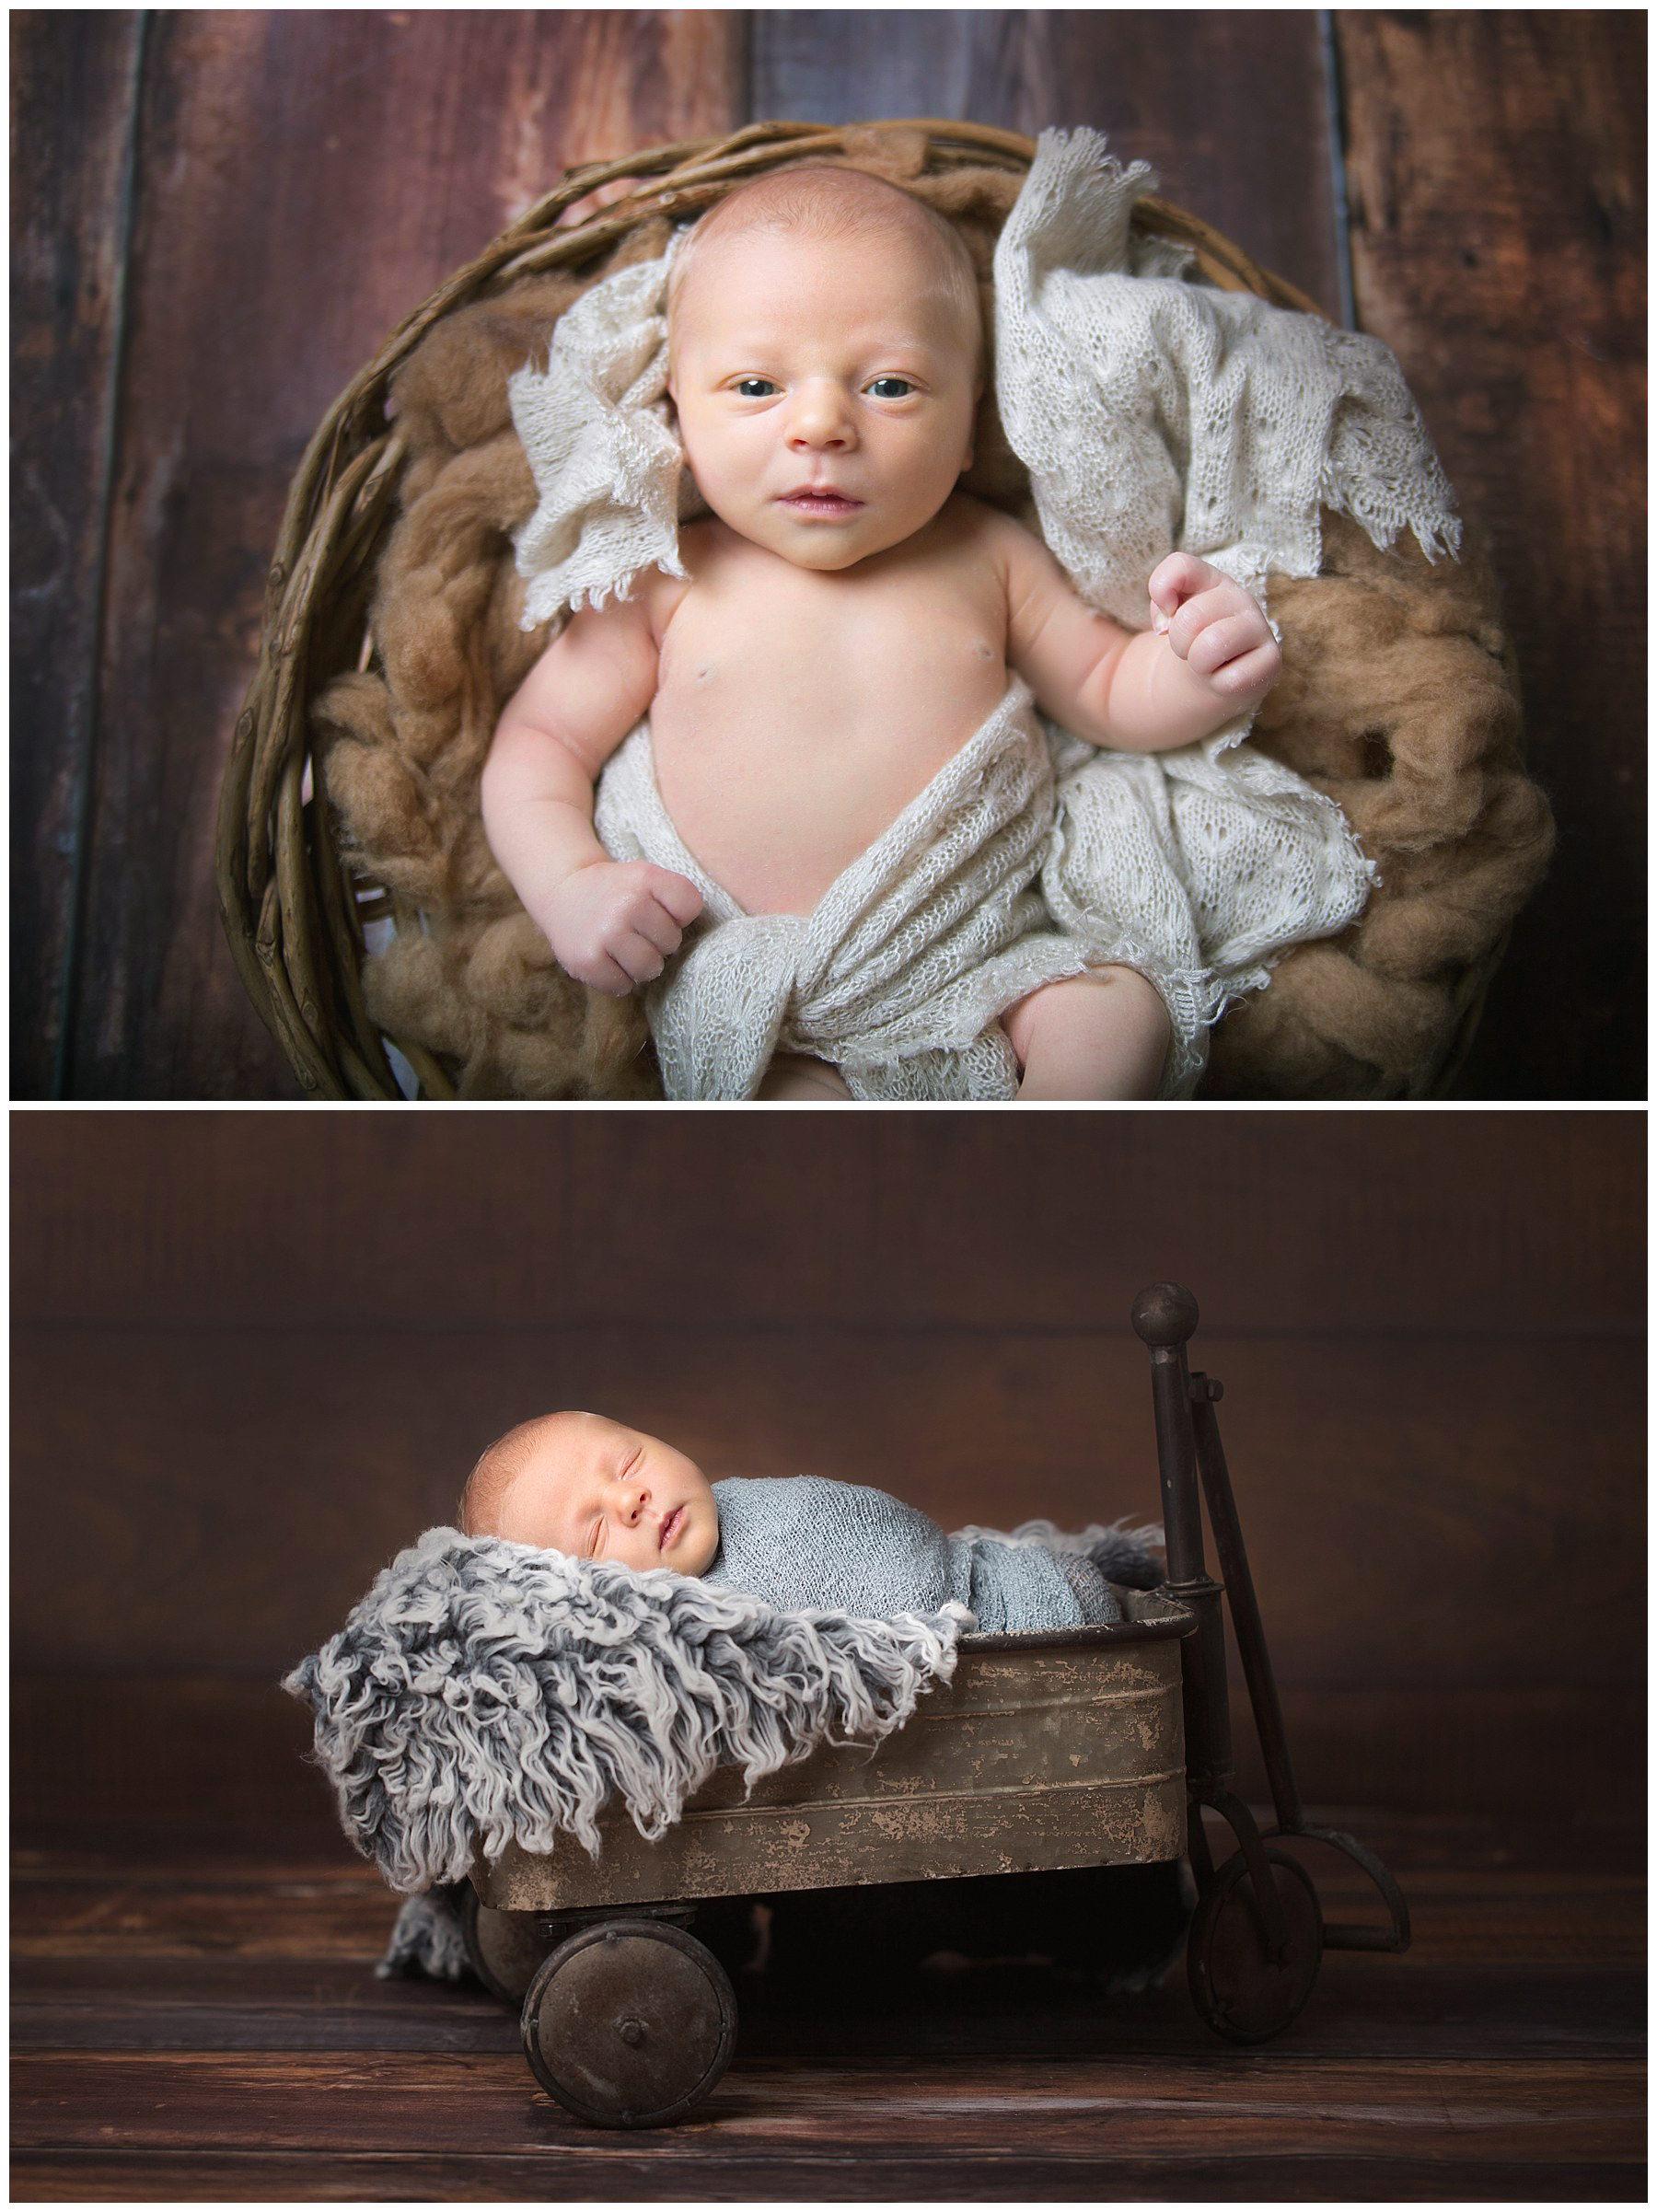 newborn photography newborn baby boy in rustic wagon and laying on brown wool